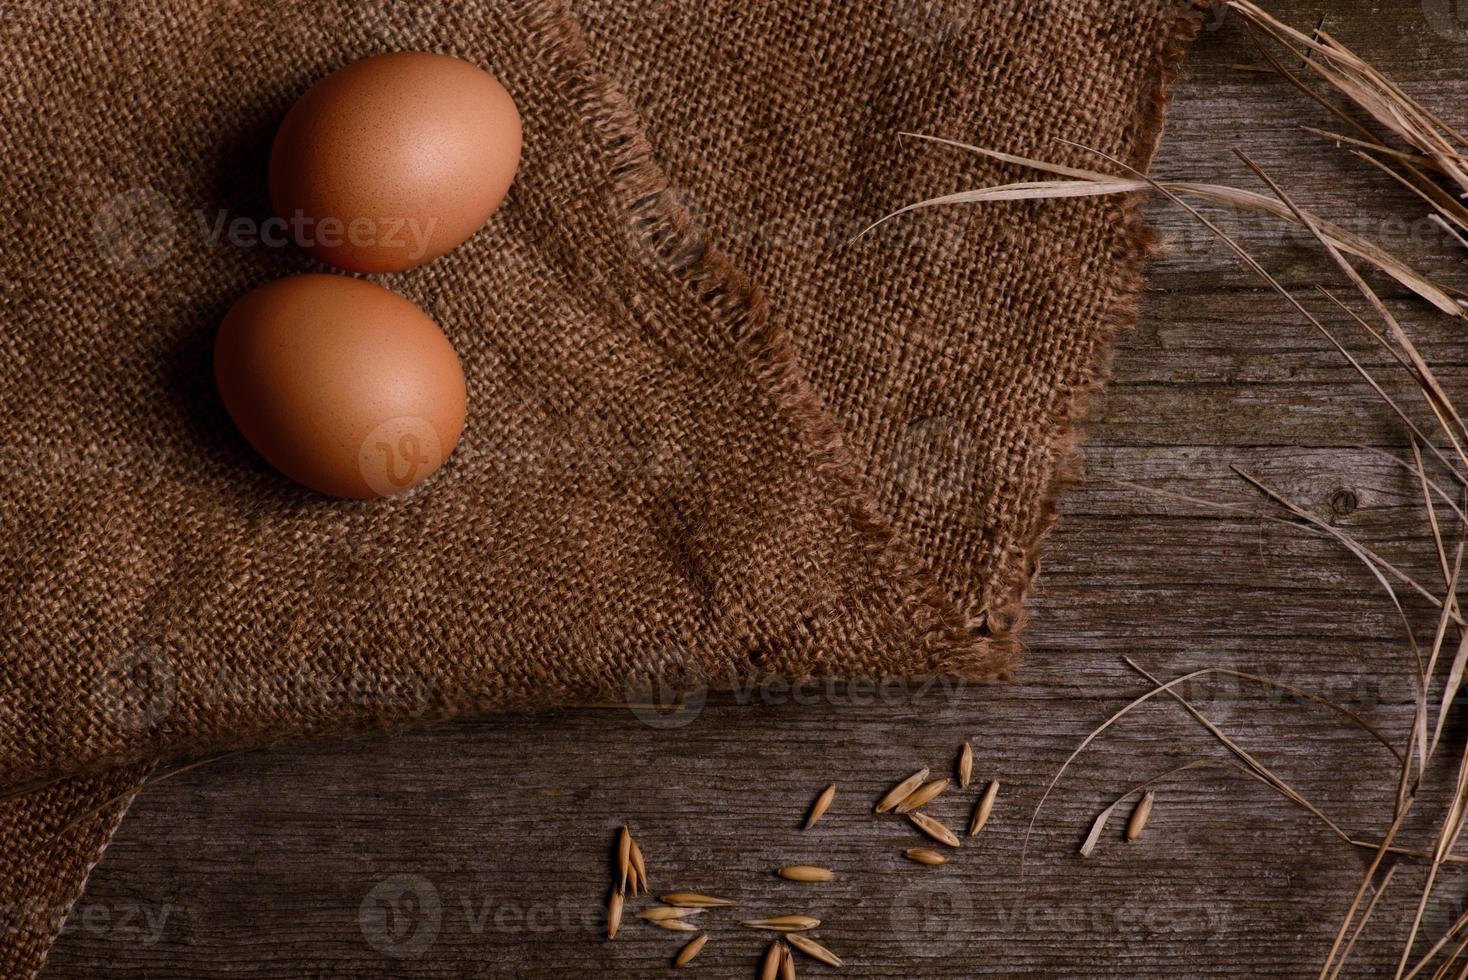 chicken eggs on burlap rustic background photo